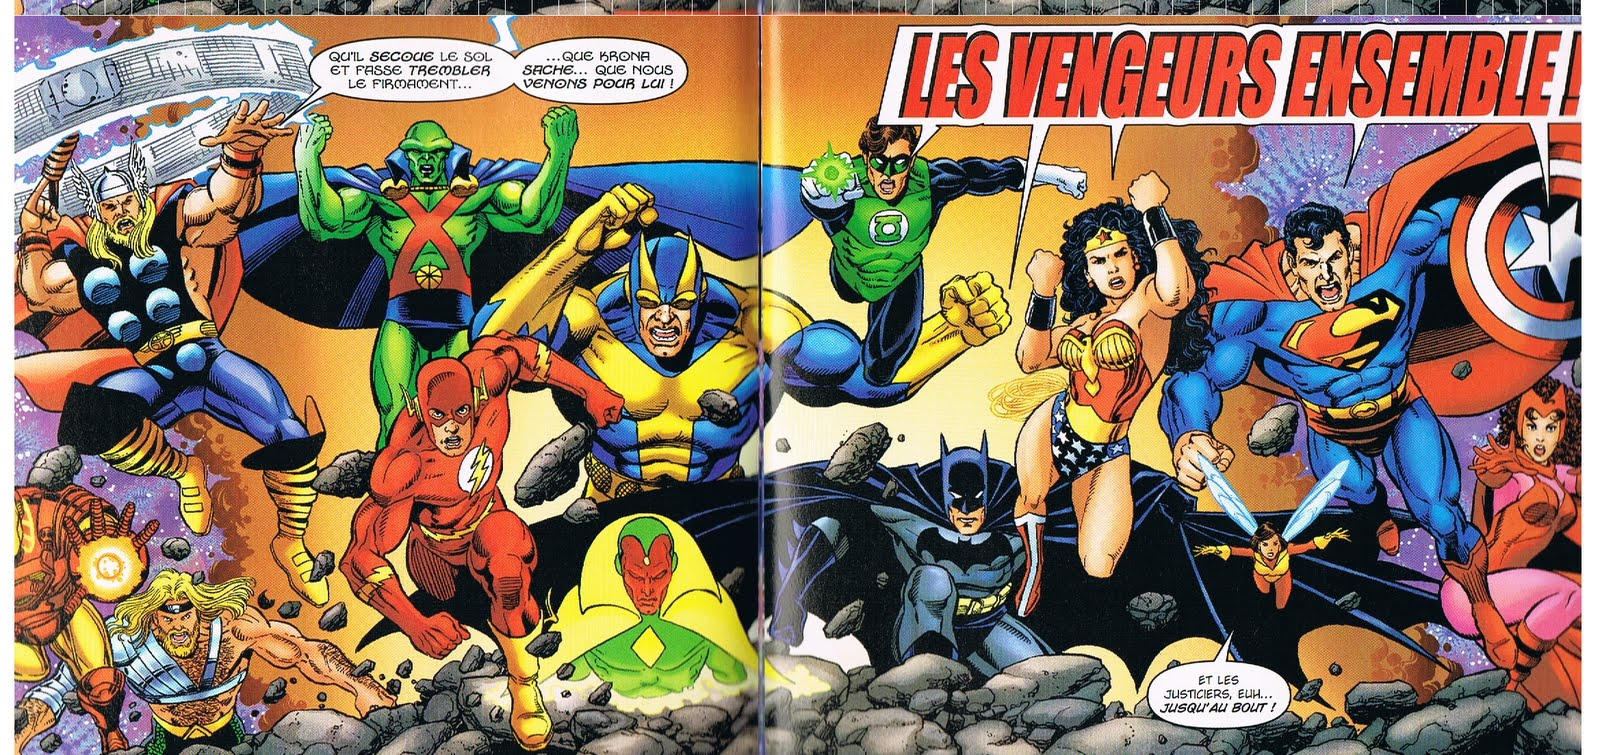 midalvers 2 0  comics  cin u00e9  jeux vid u00e9os etc     les